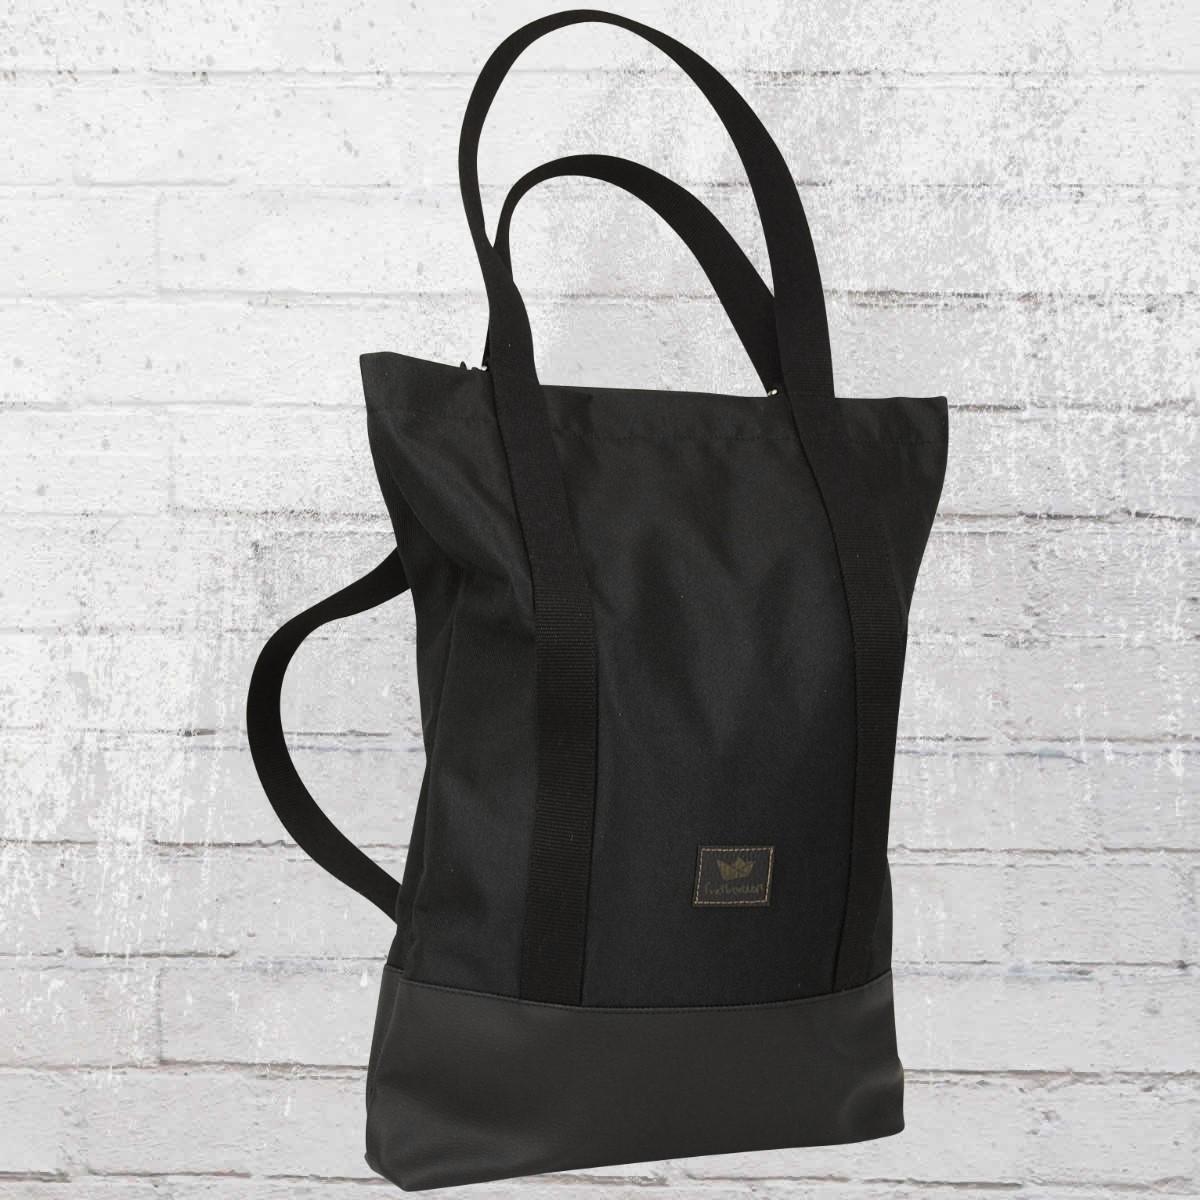 Freibeutler Tasche Shopper Pauli Bag Rucksack schwarz